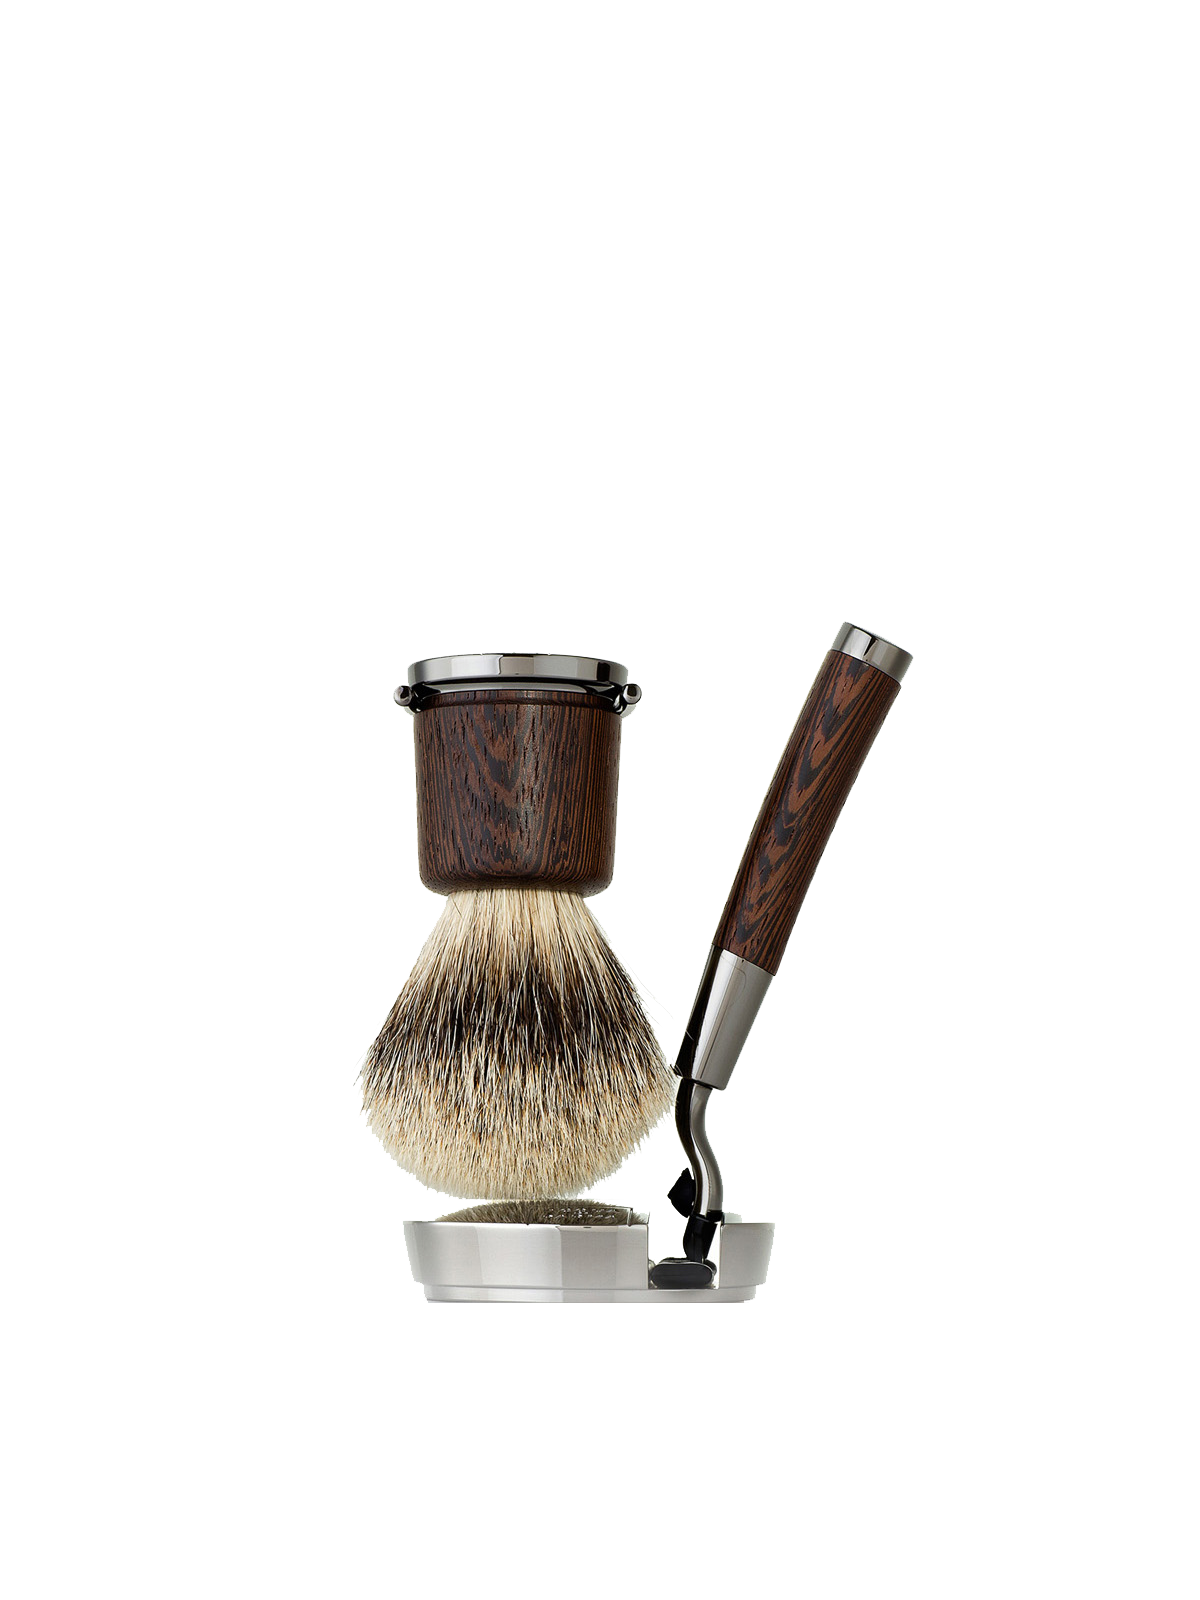 Shaving Brush and Razor